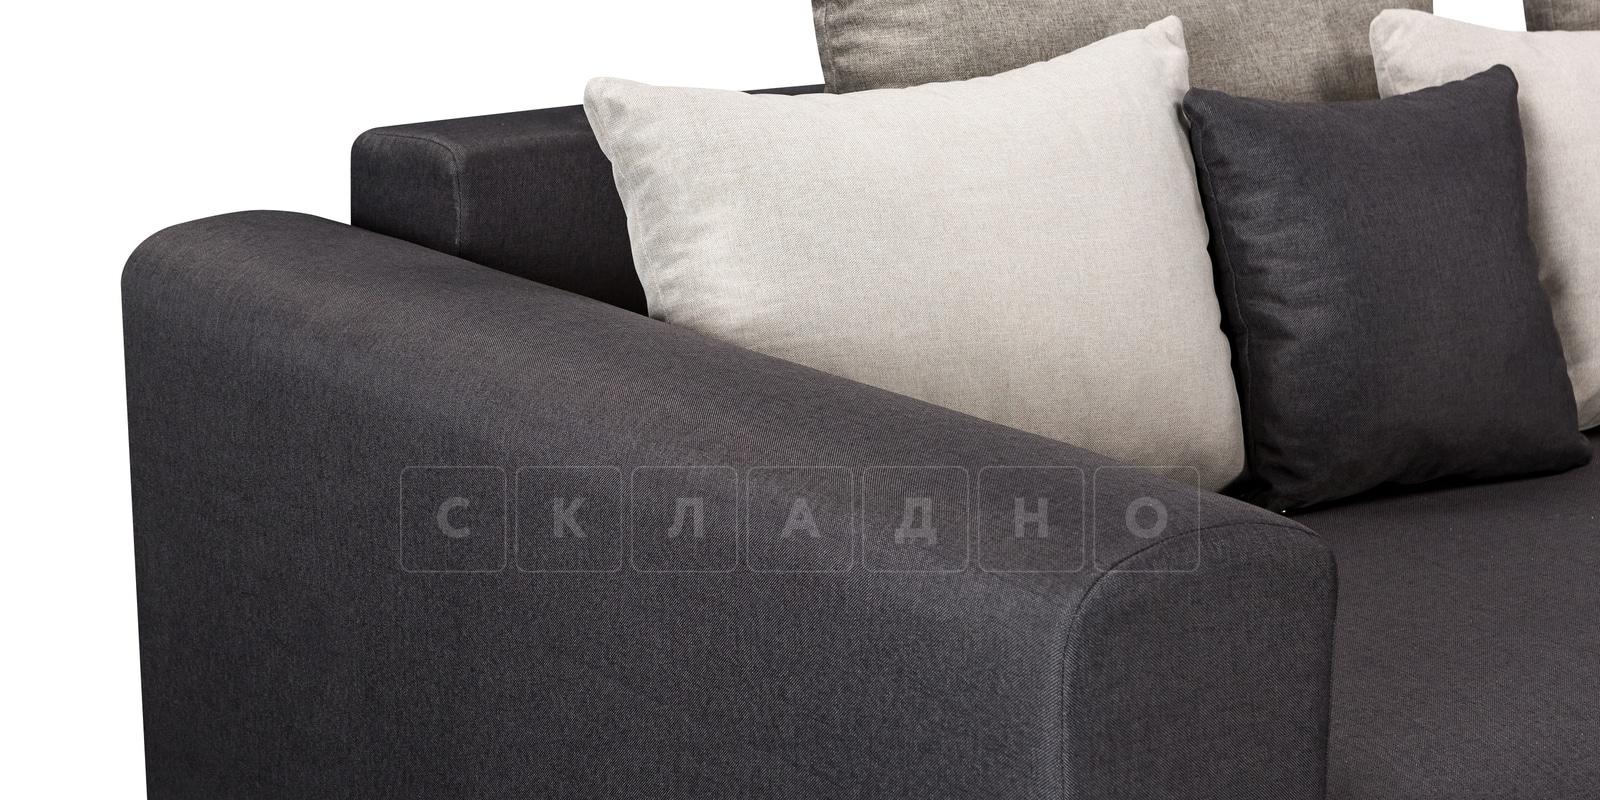 Диван Медисон темно-серый 325 см фото 5 | интернет-магазин Складно